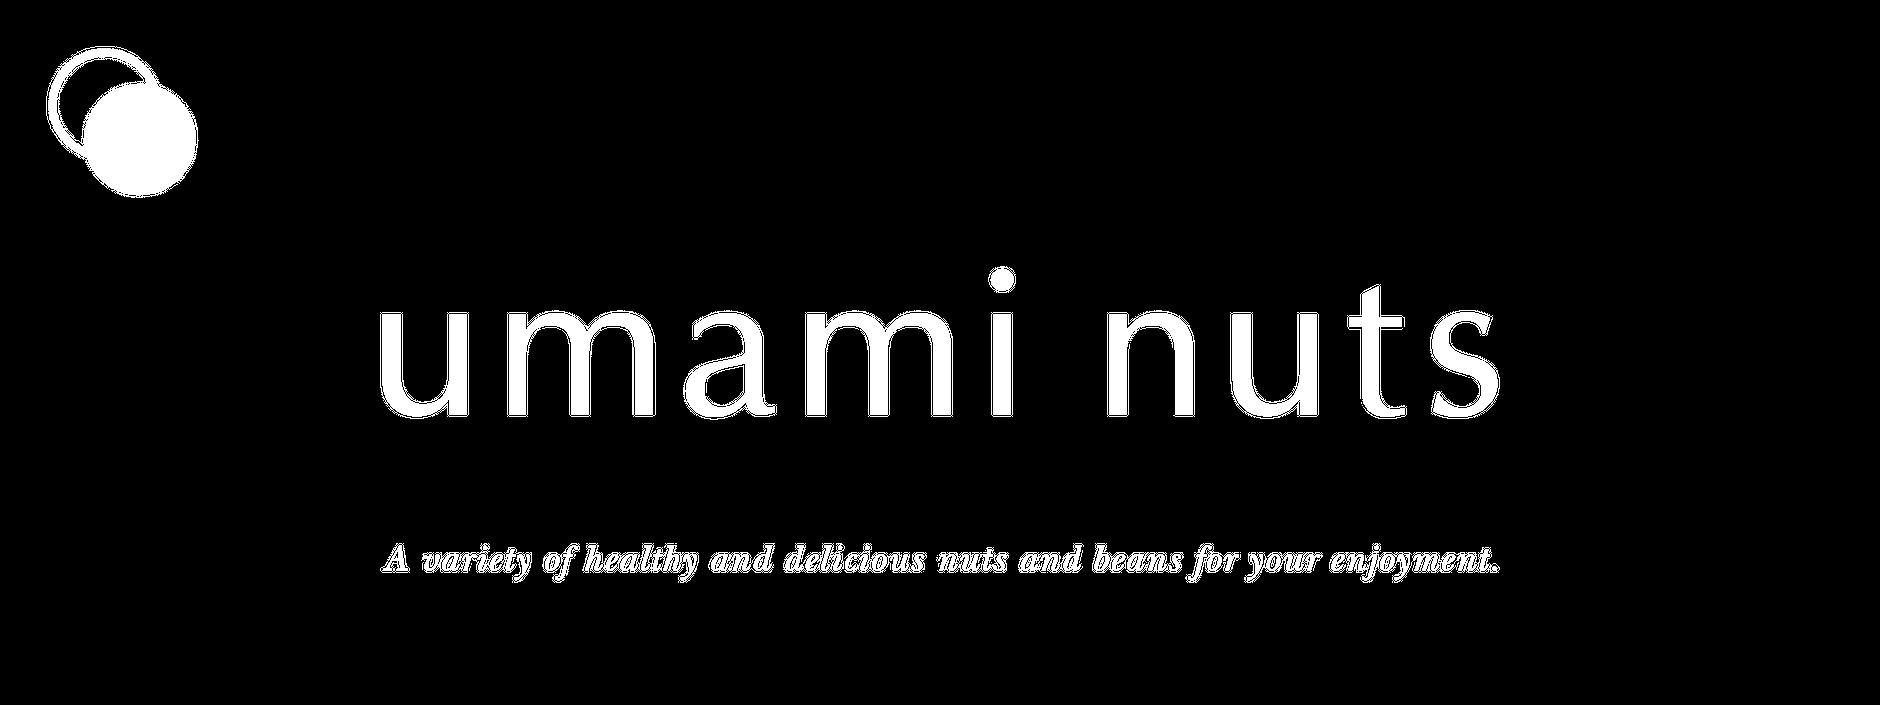 umami nuts